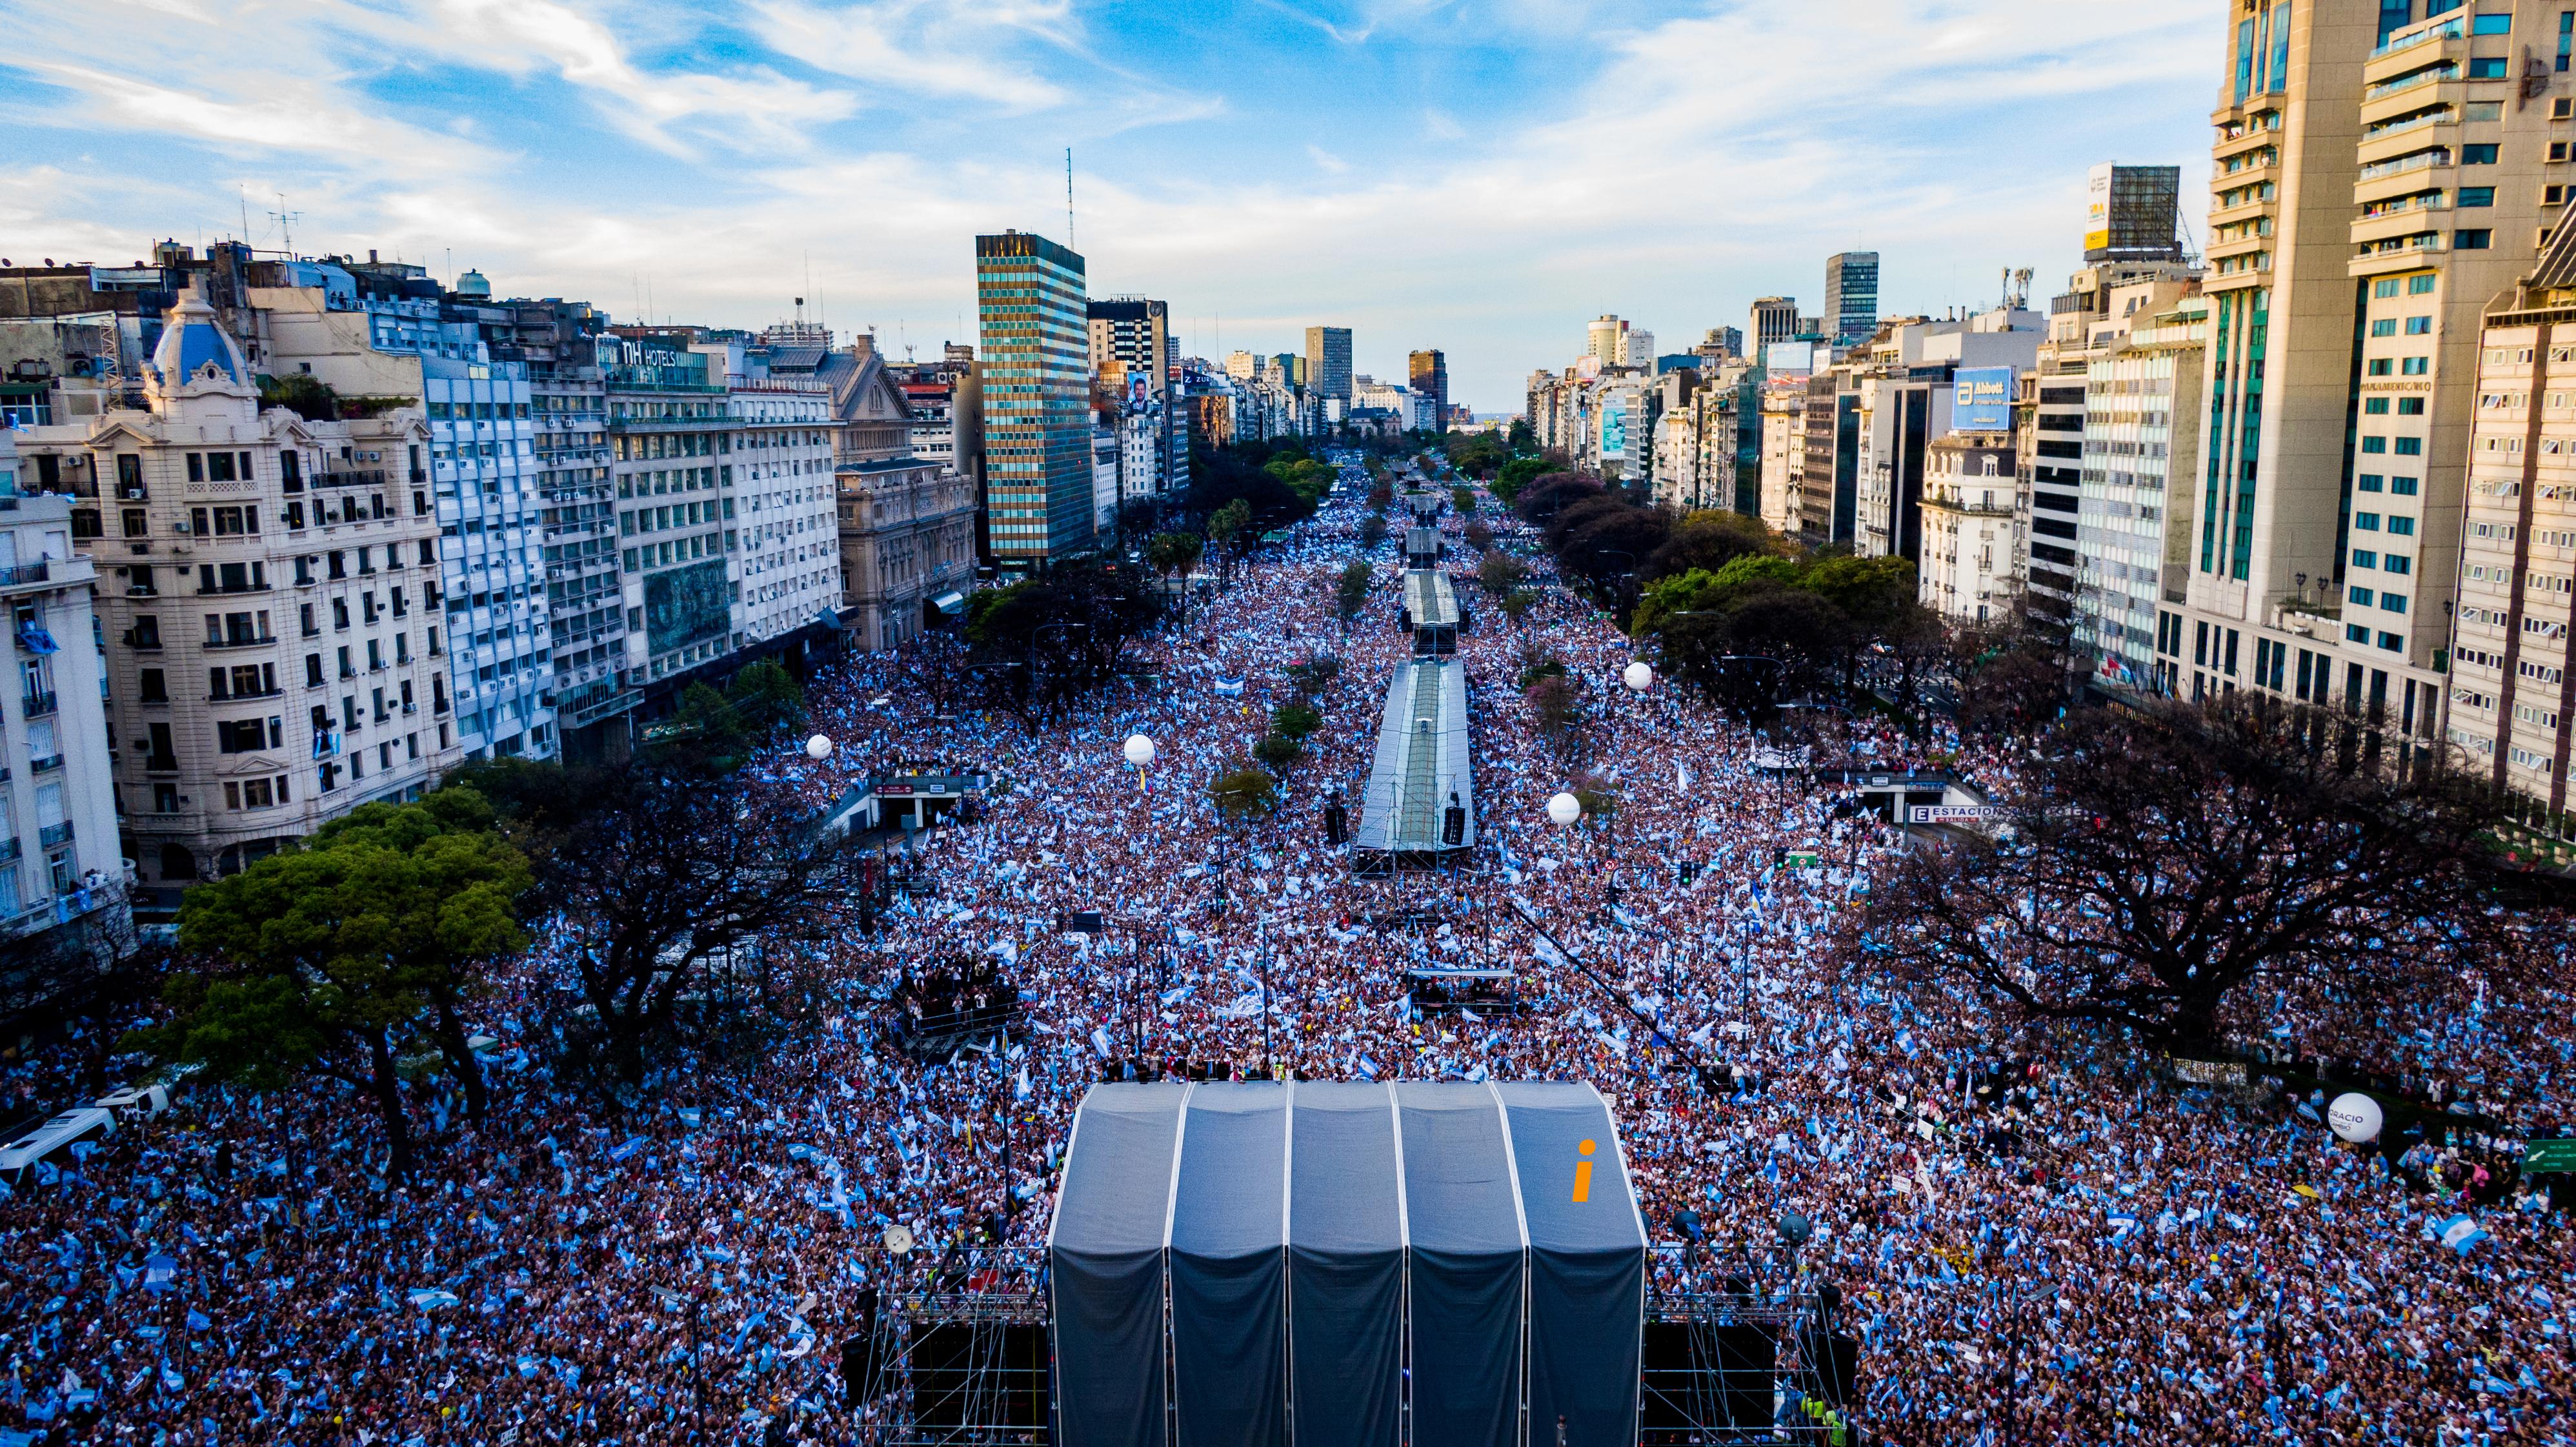 Trescientas mil personas -o cerca de medio millón según los organizadores- se reunieron en el Obelisco para escuchar a Mauricio Macri (Thomas Khazki)